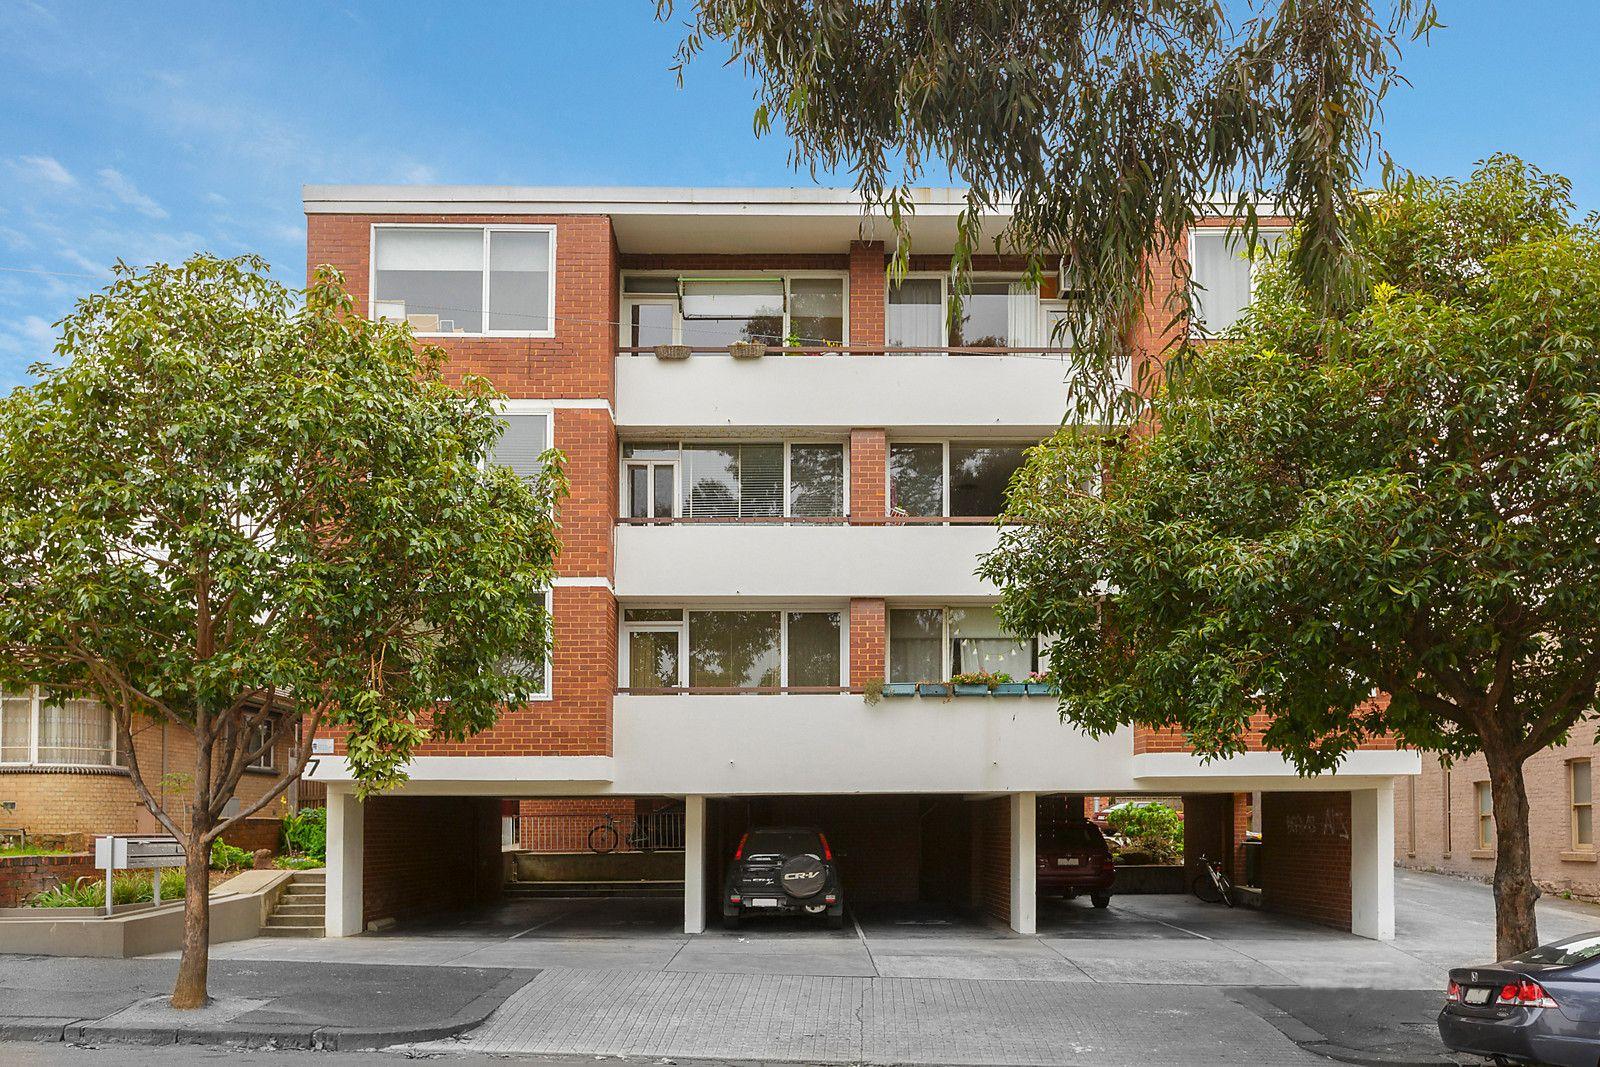 2/7 Curran Street, North Melbourne VIC 3051, Image 0